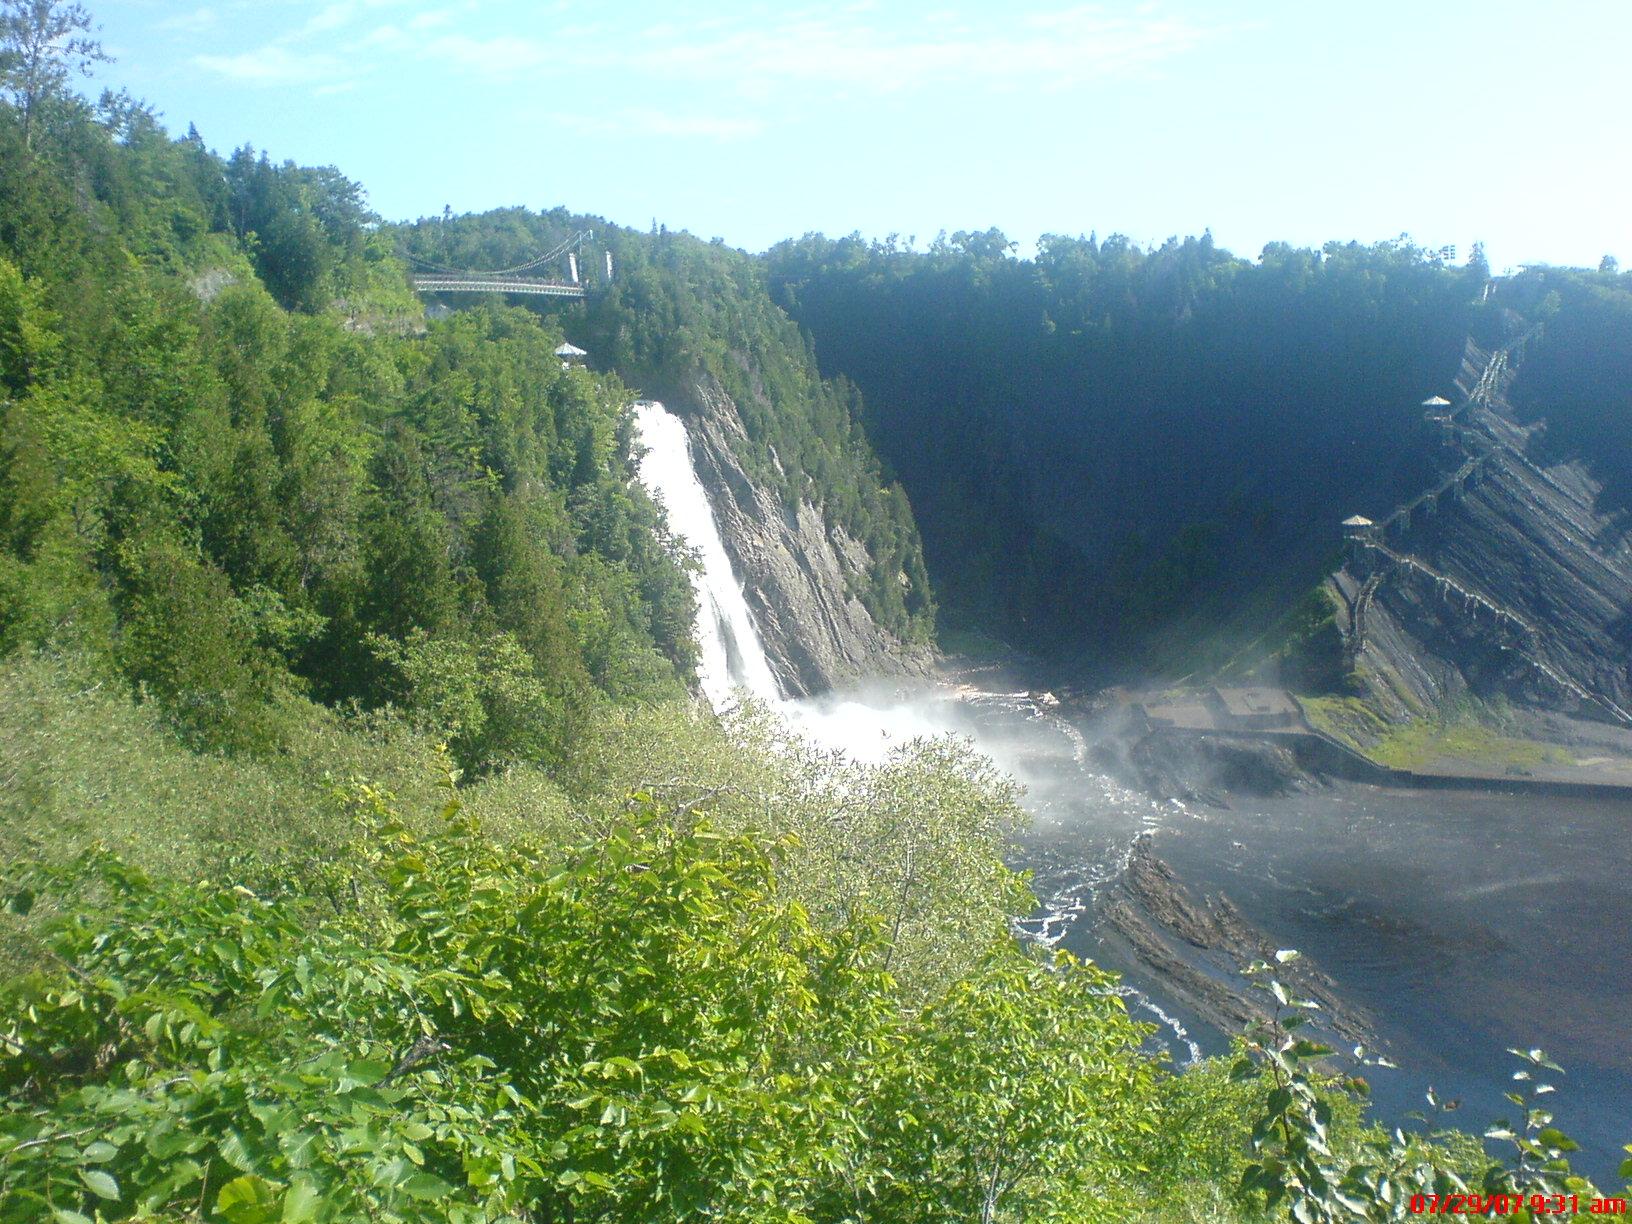 Quebec City, Montmorency Falls